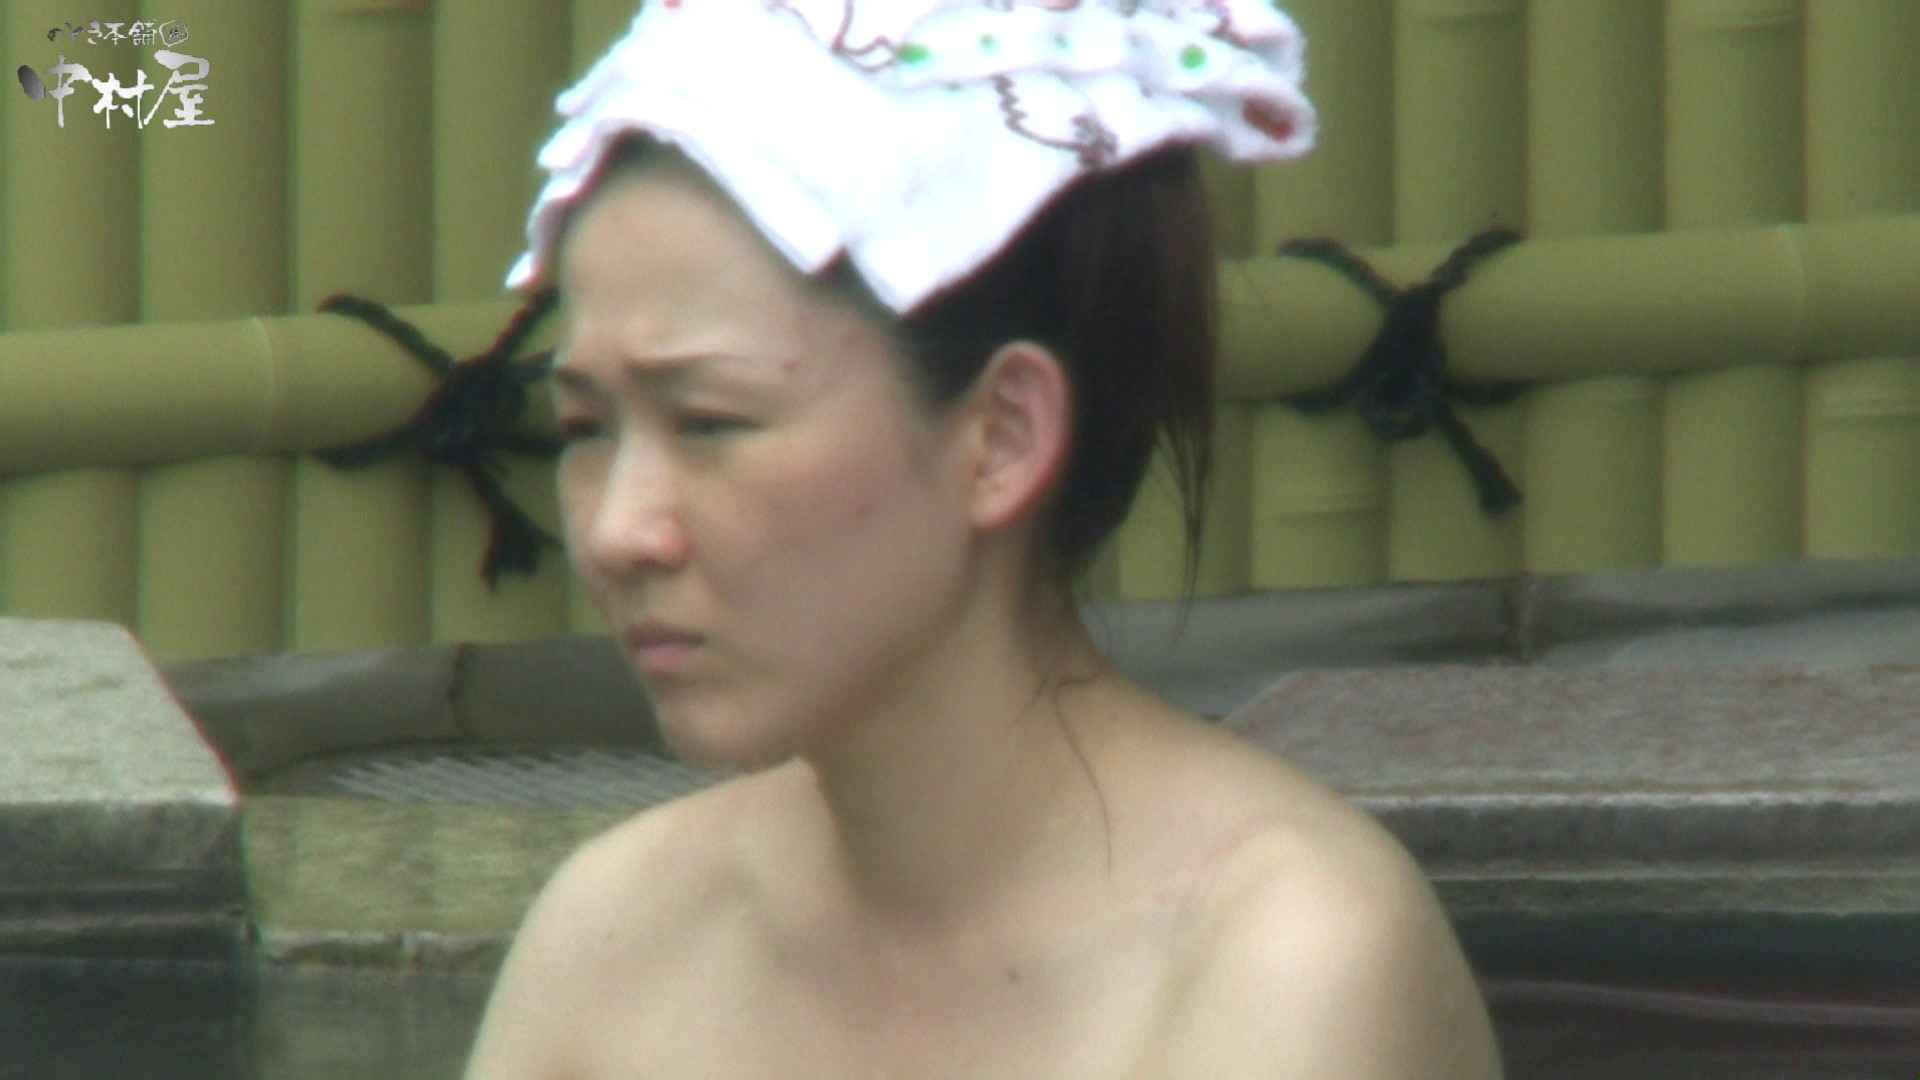 Aquaな露天風呂Vol.943 盗撮  53連発 12